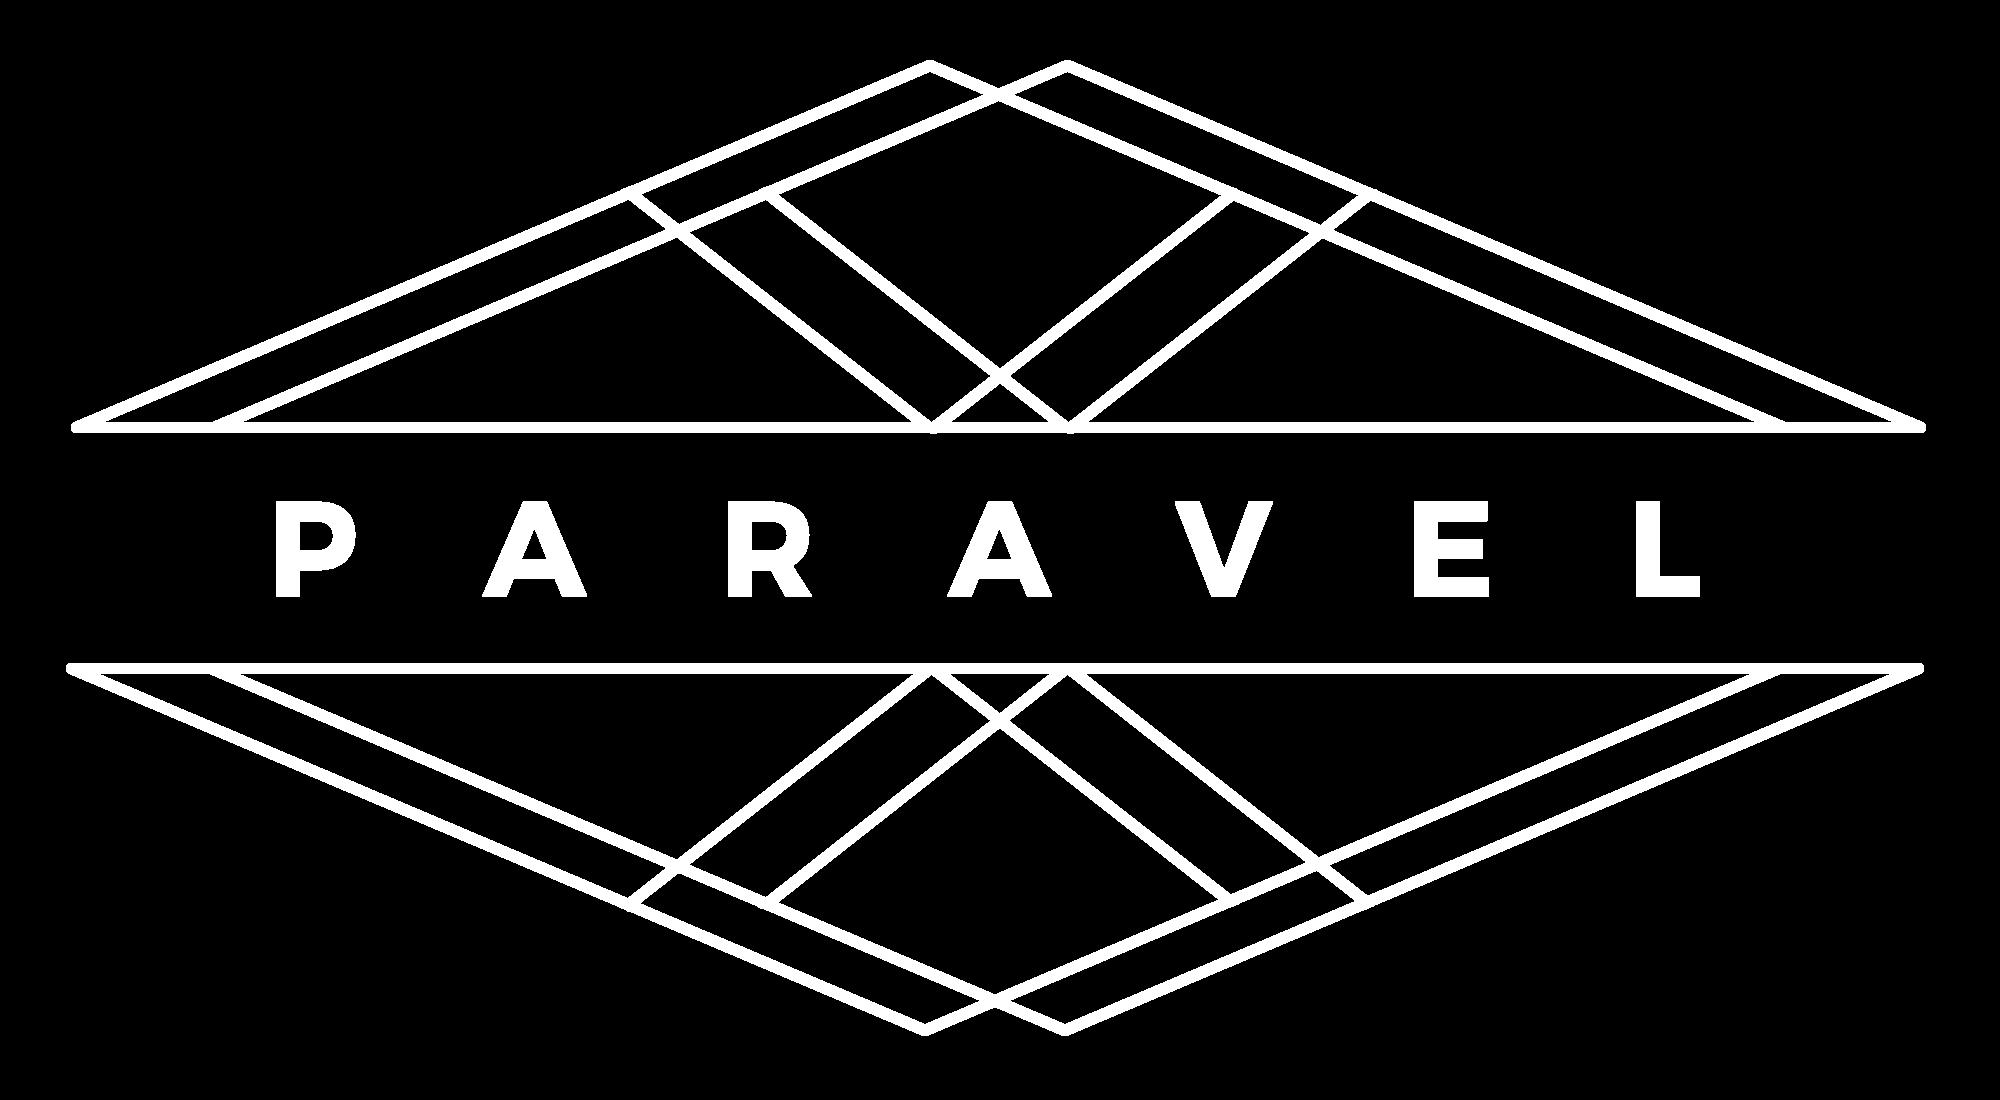 PARAVEL geometry logo - light logo:transparent background.png